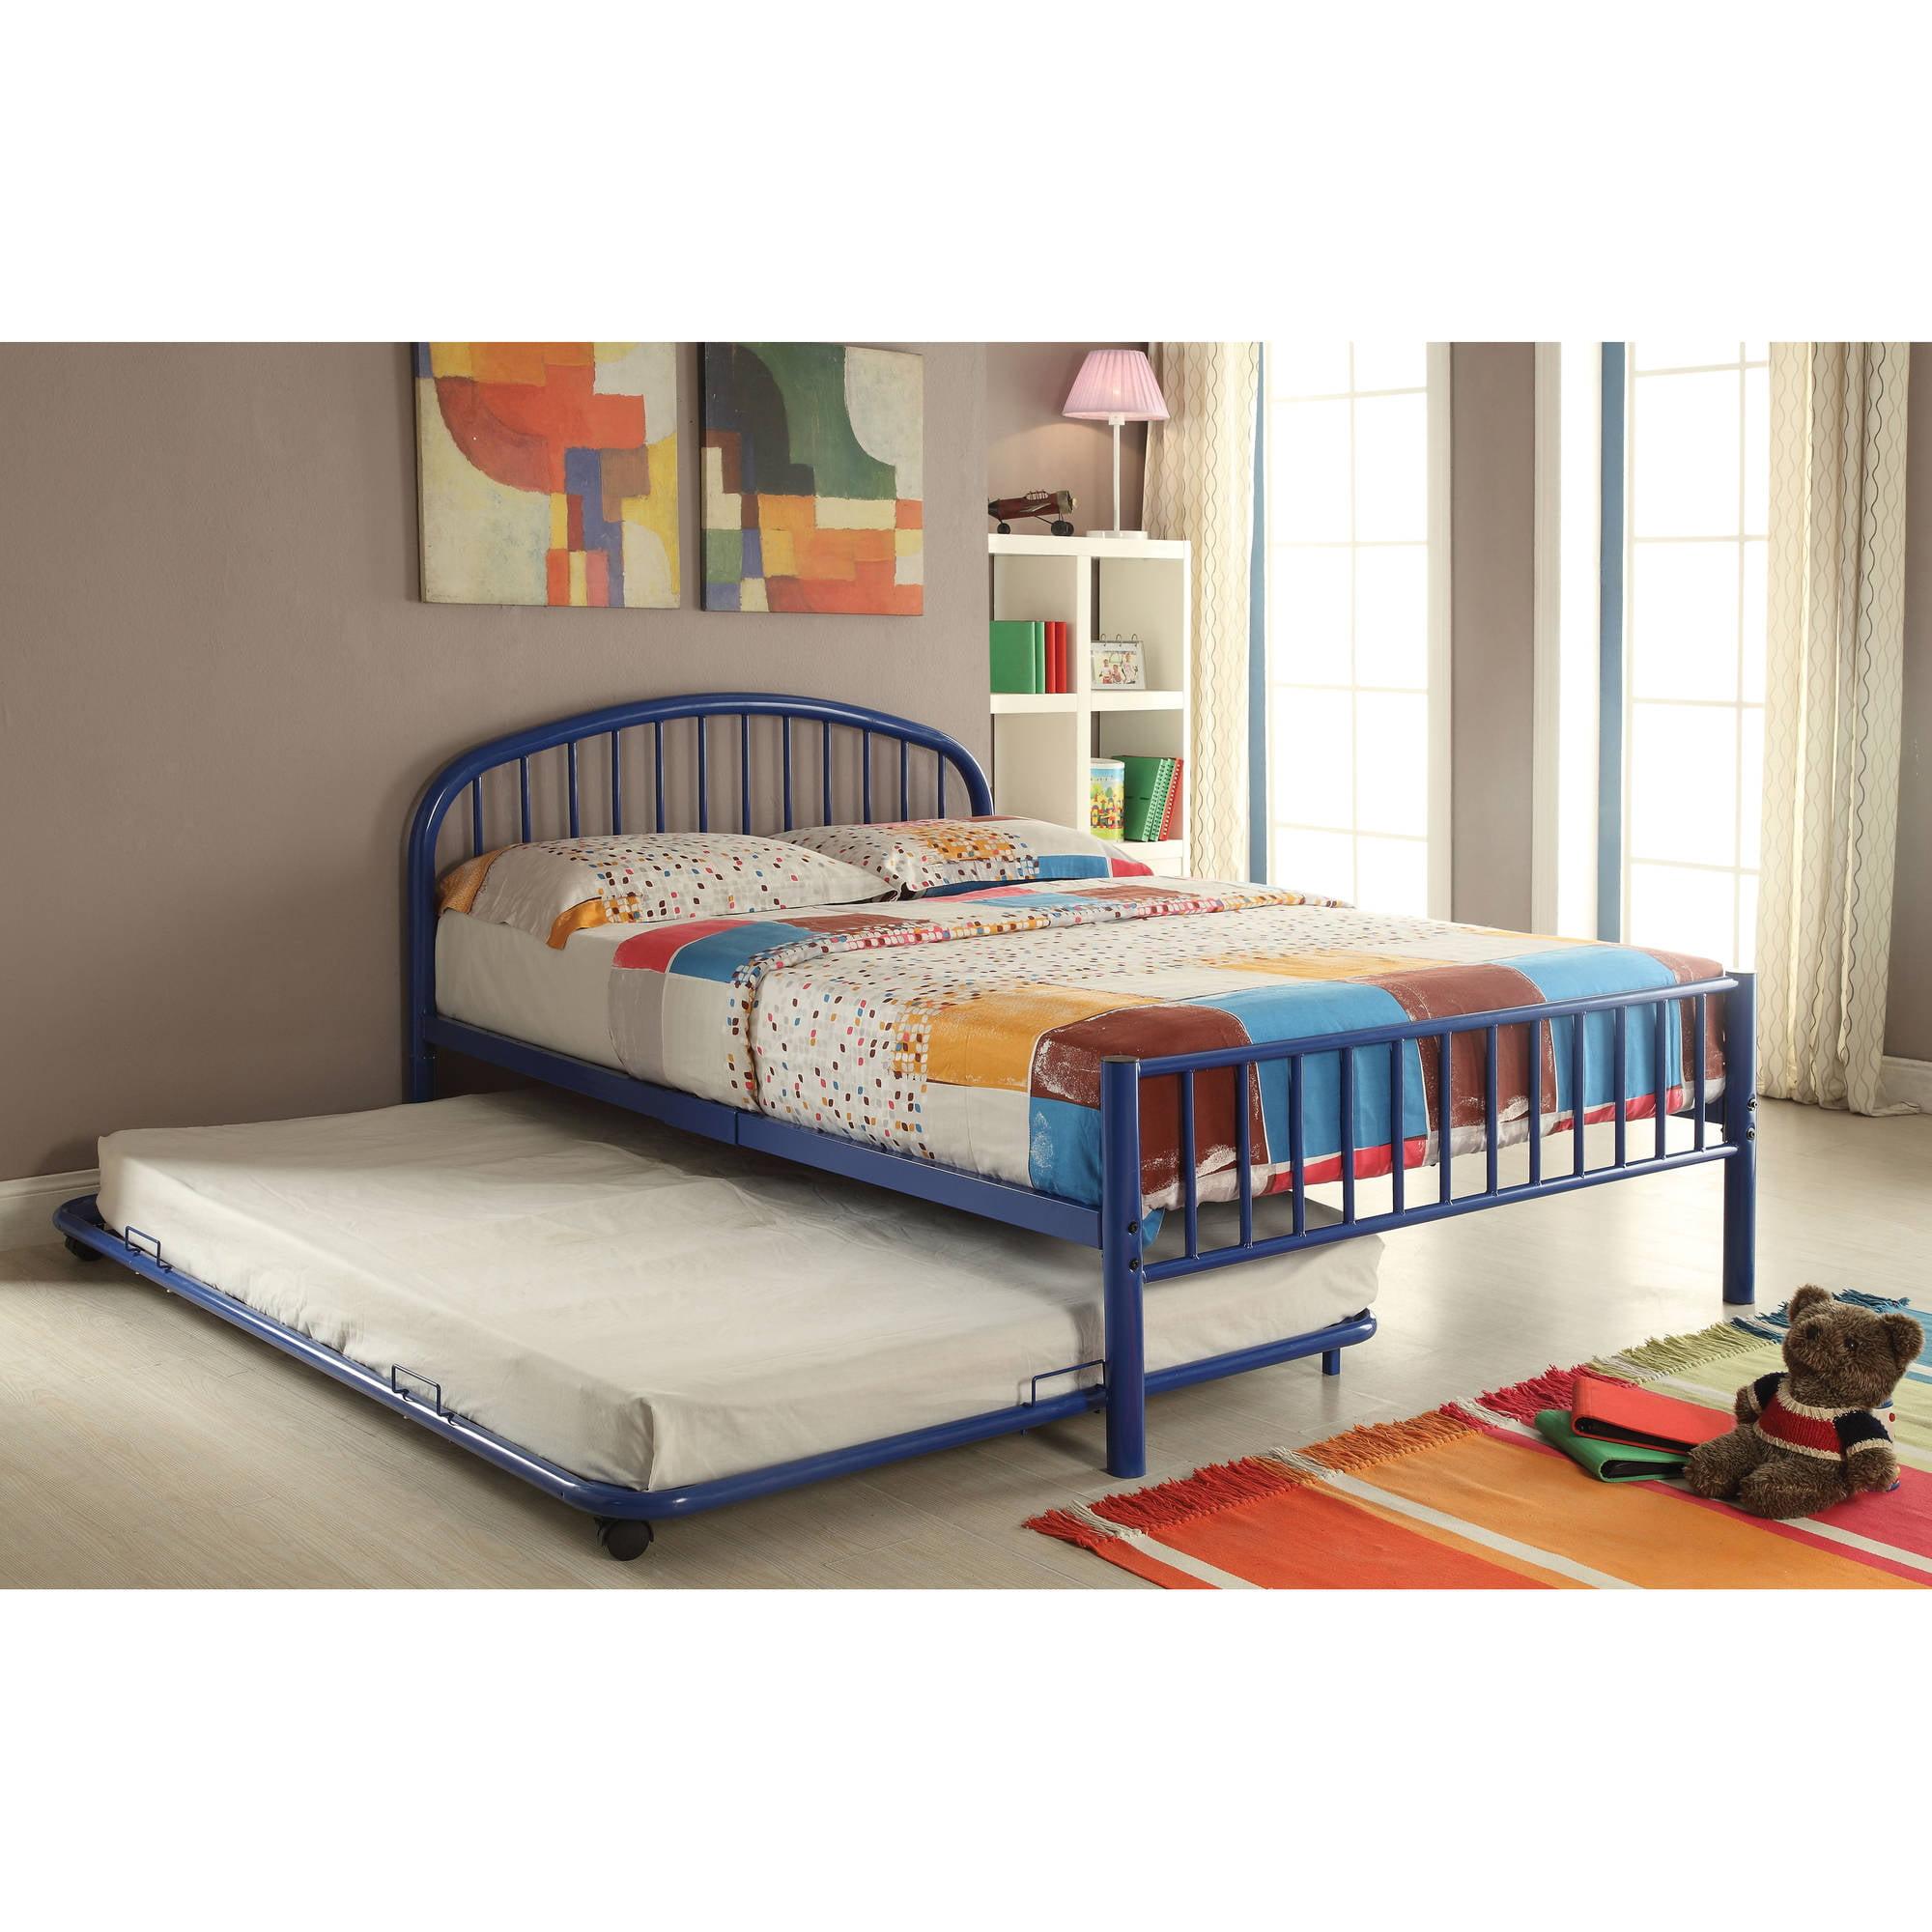 Daybeds At Nebraska Furniture Mart : Ne kids walnut street riley full sleigh bed with trundle